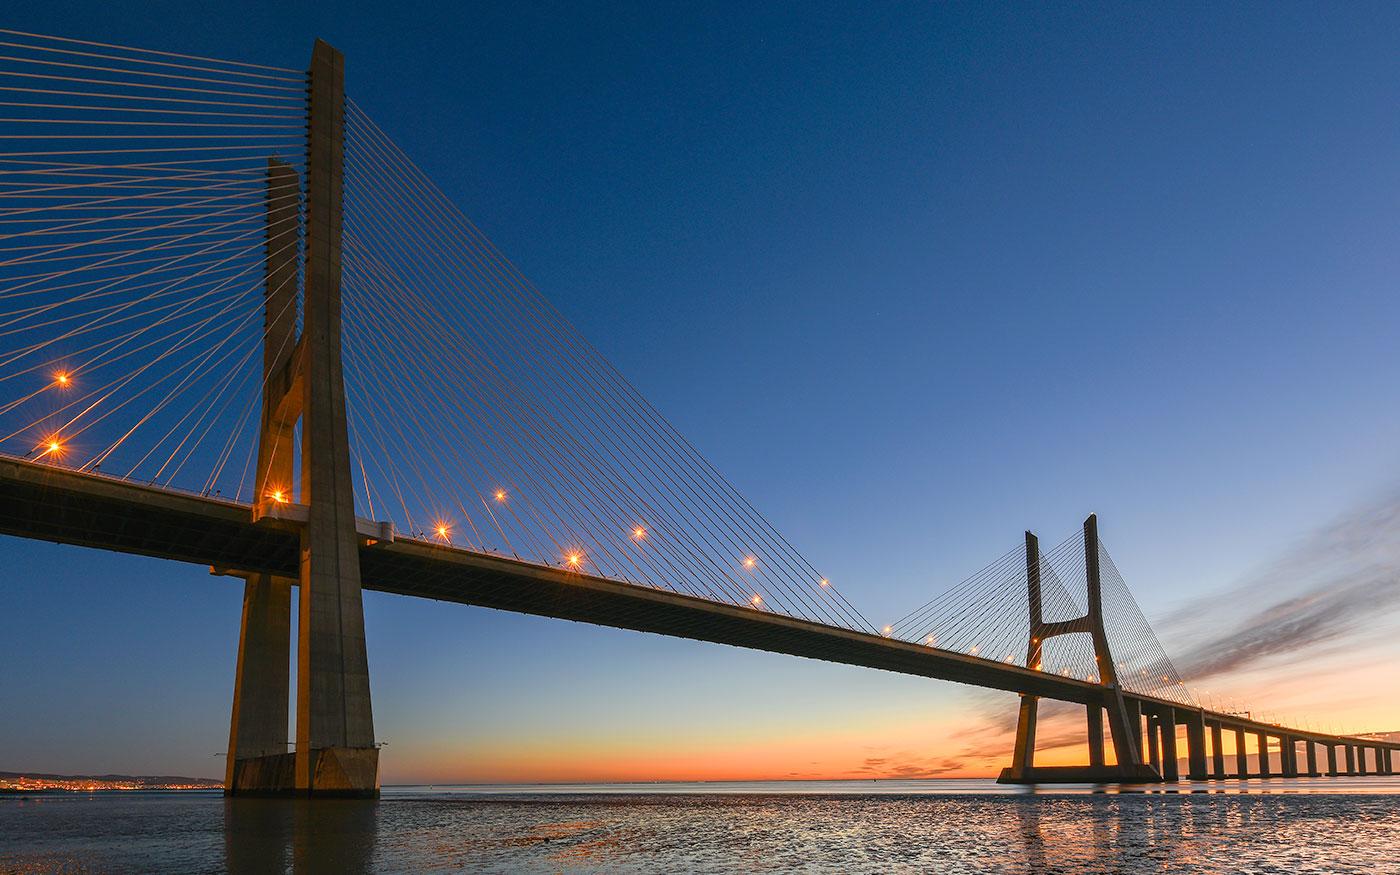 case history ponte 25 aprile Lisbona, Sinelec